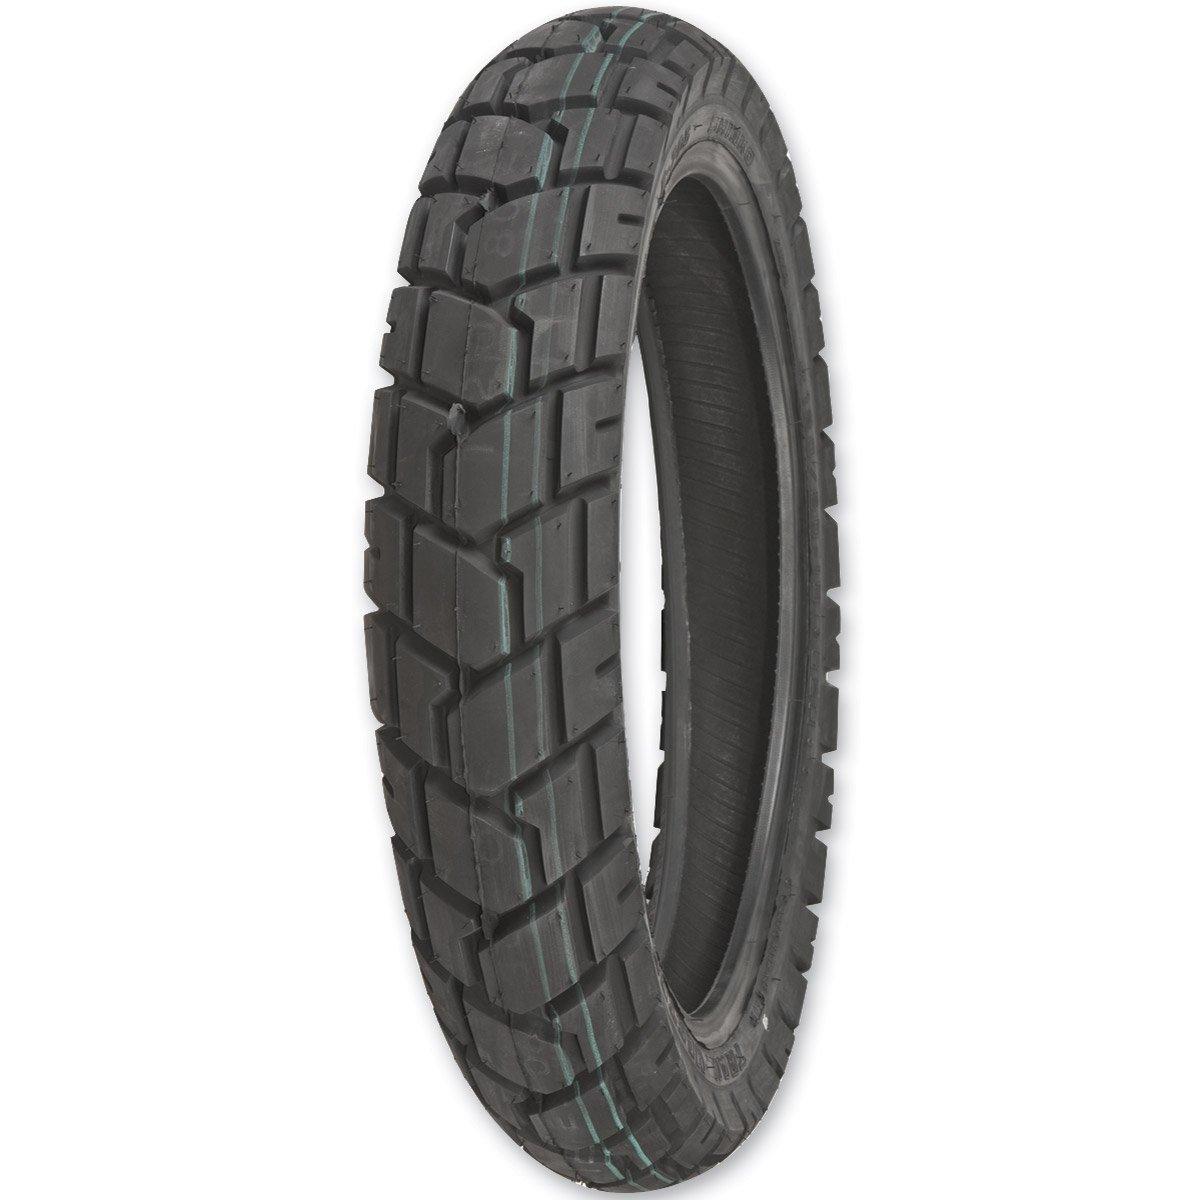 Shinko Dual Sport 705 Series Front/Rear Tire (120/90-17TT) 4333046842 87-4520-MPR2